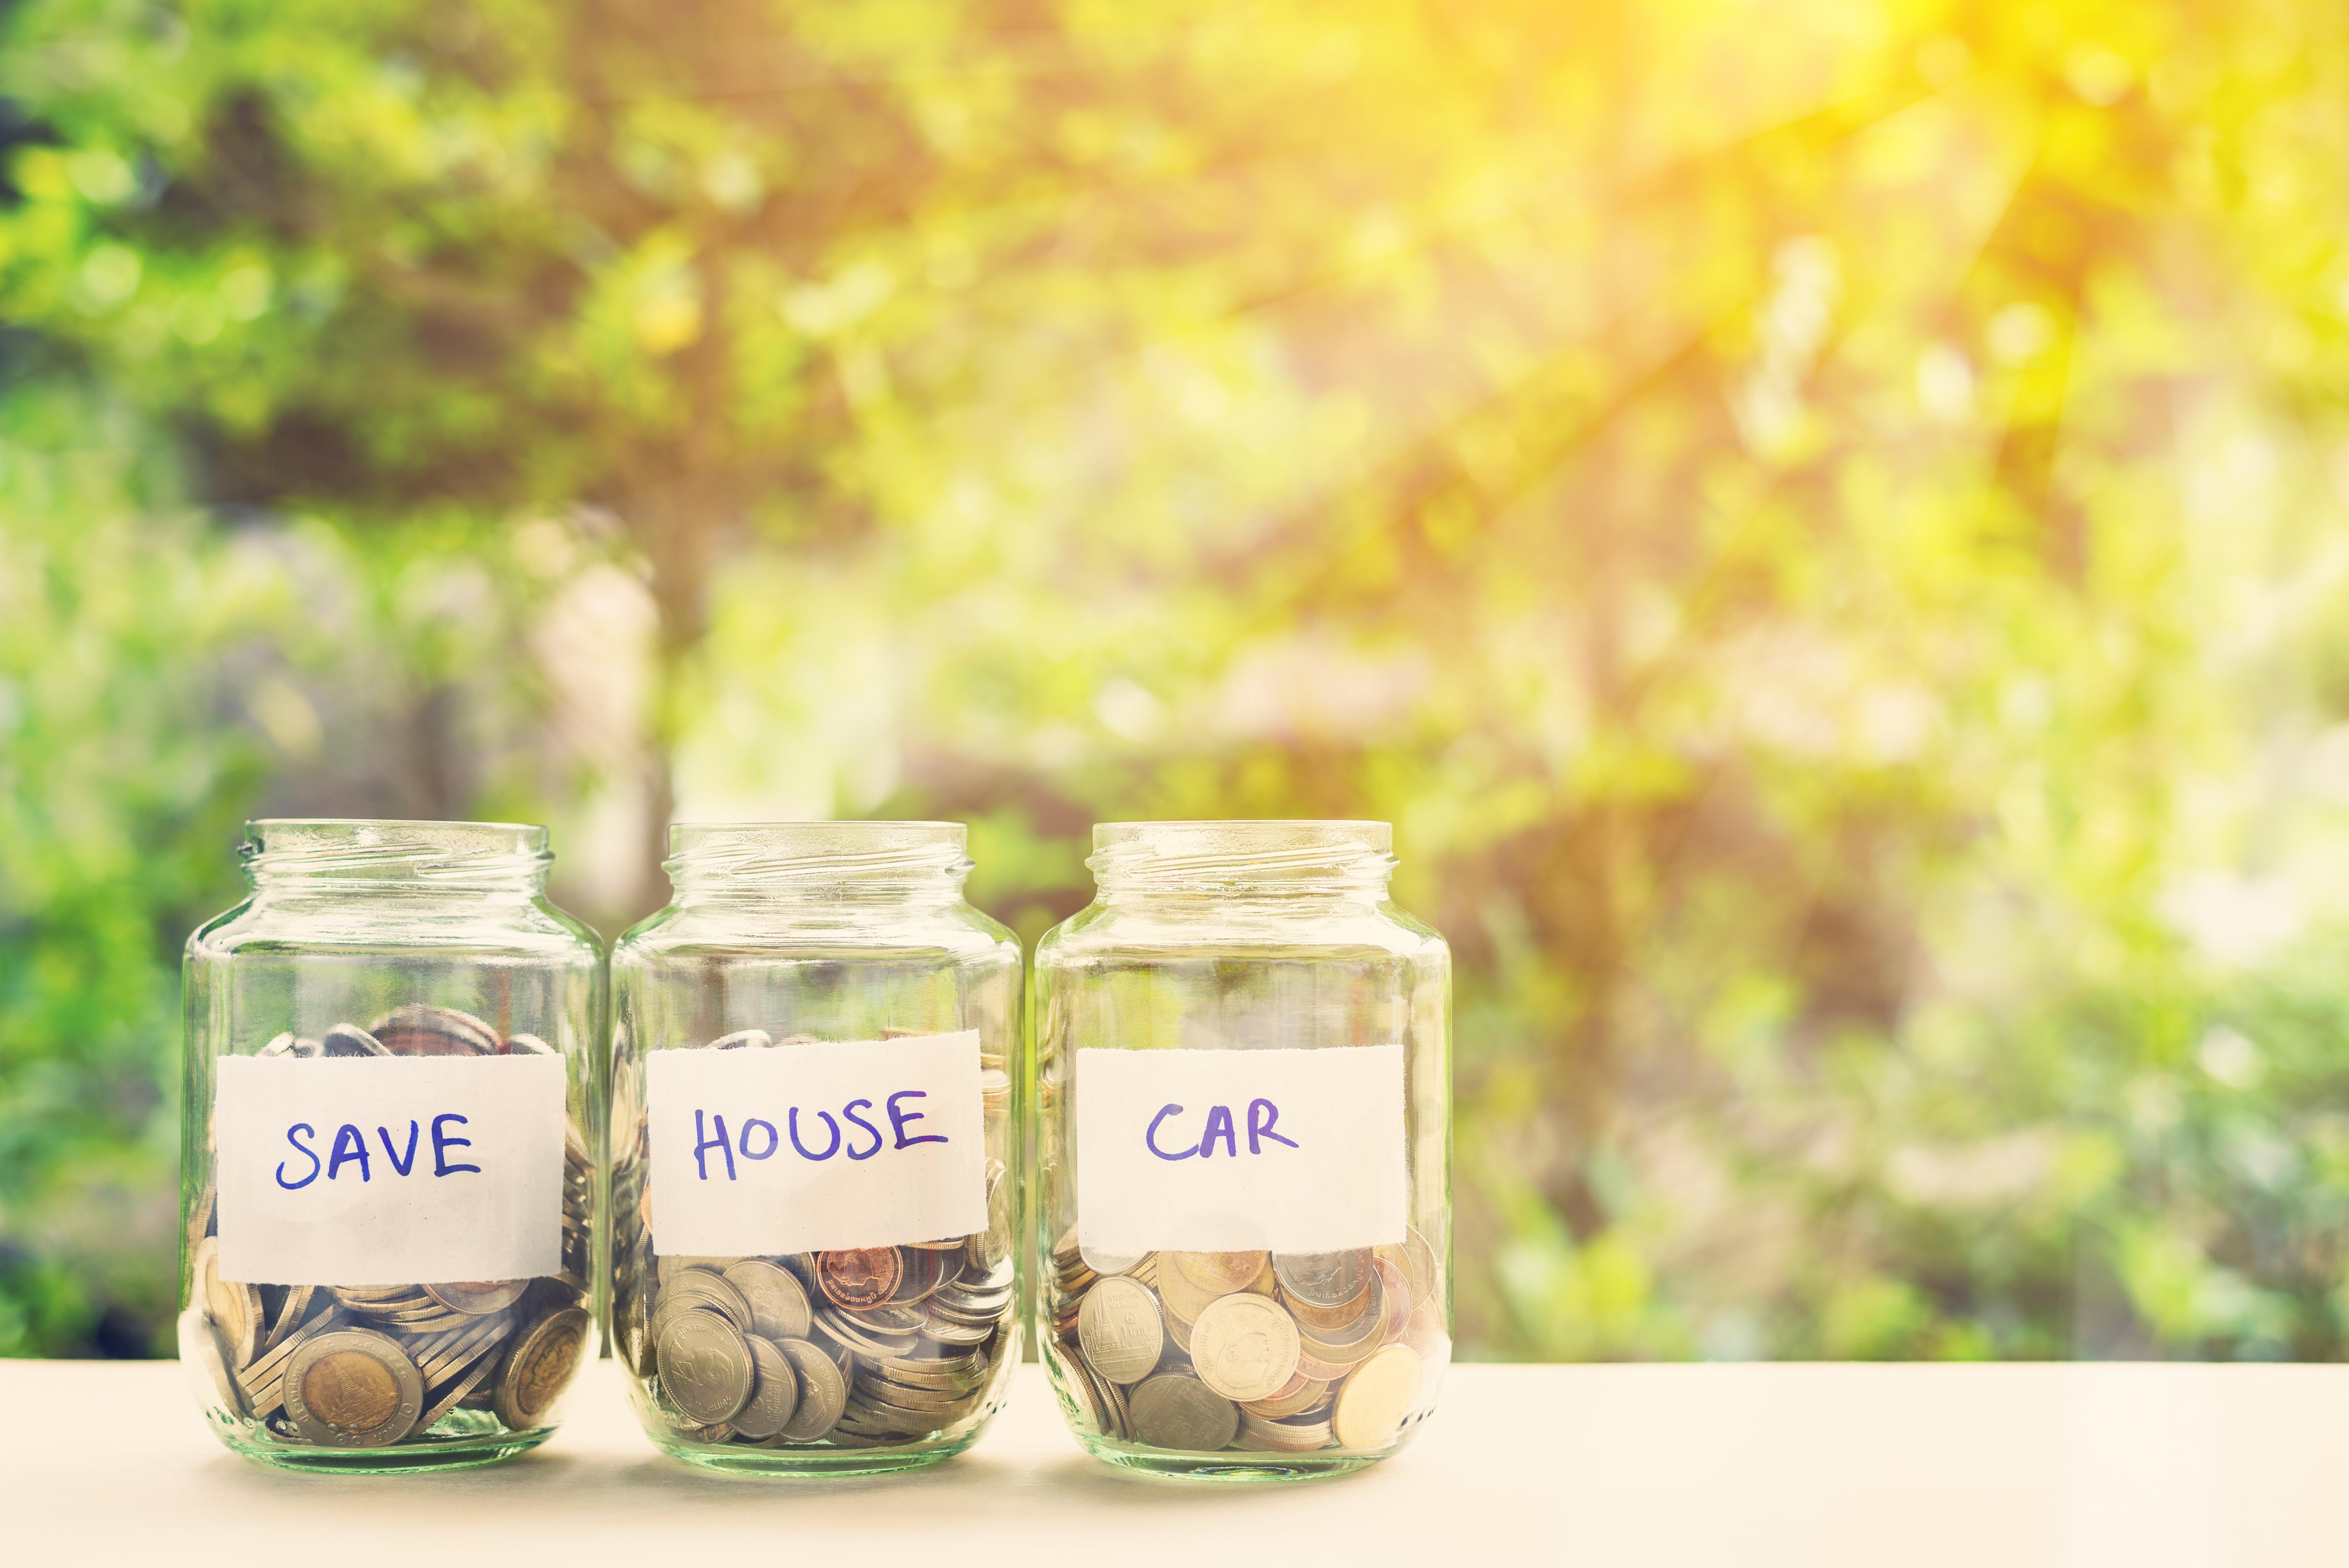 Balanced Borrowing and Saving